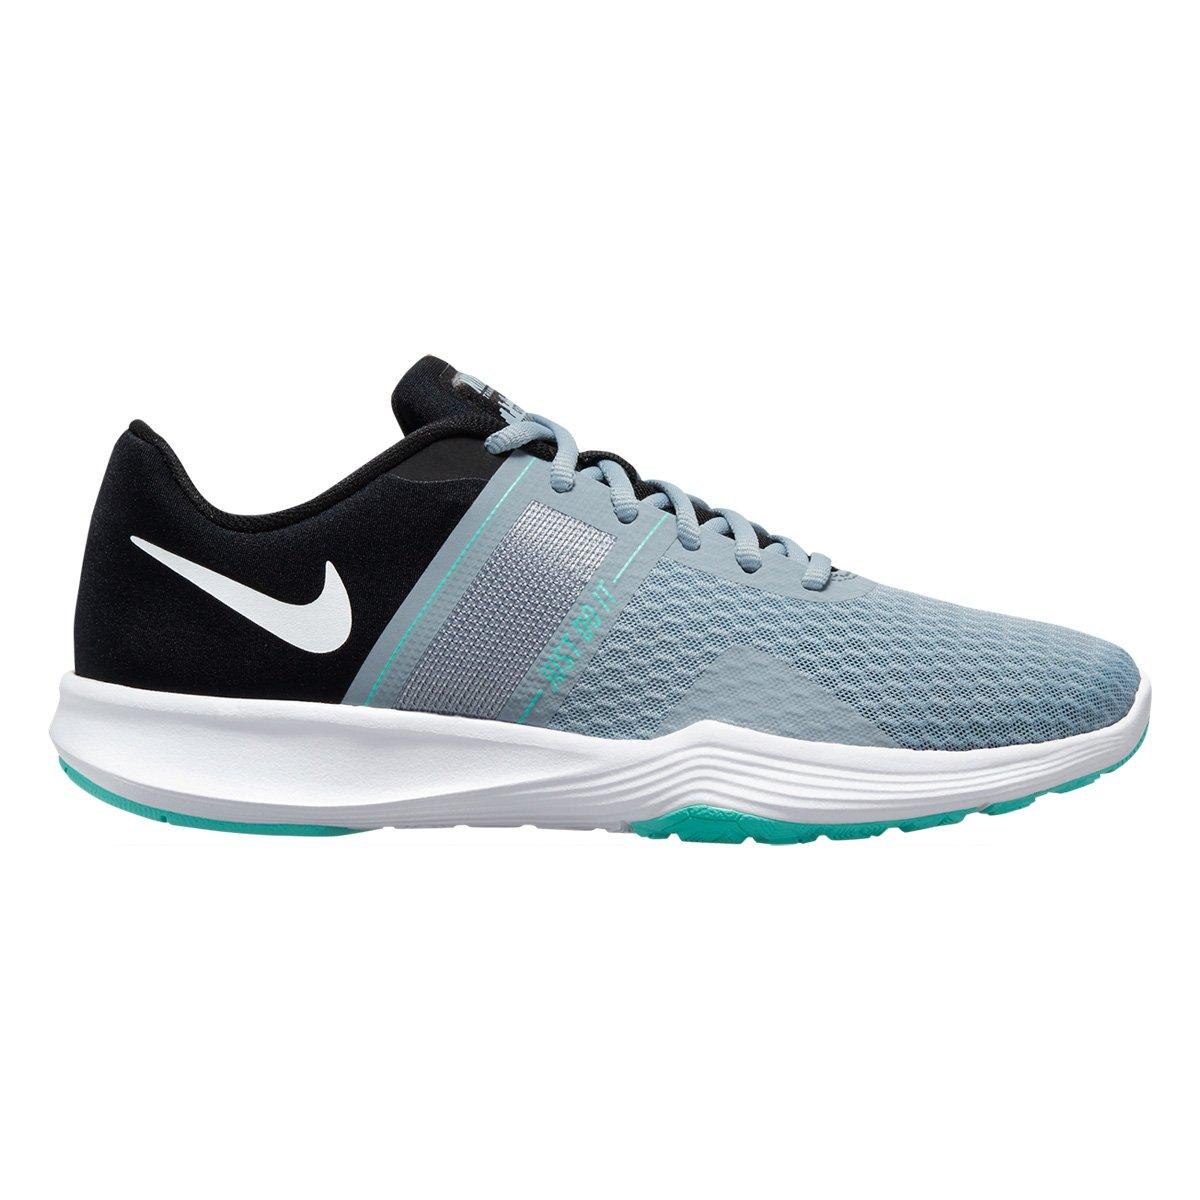 Tênis Nike City Trainer 2 Feminino - Preto e Prata